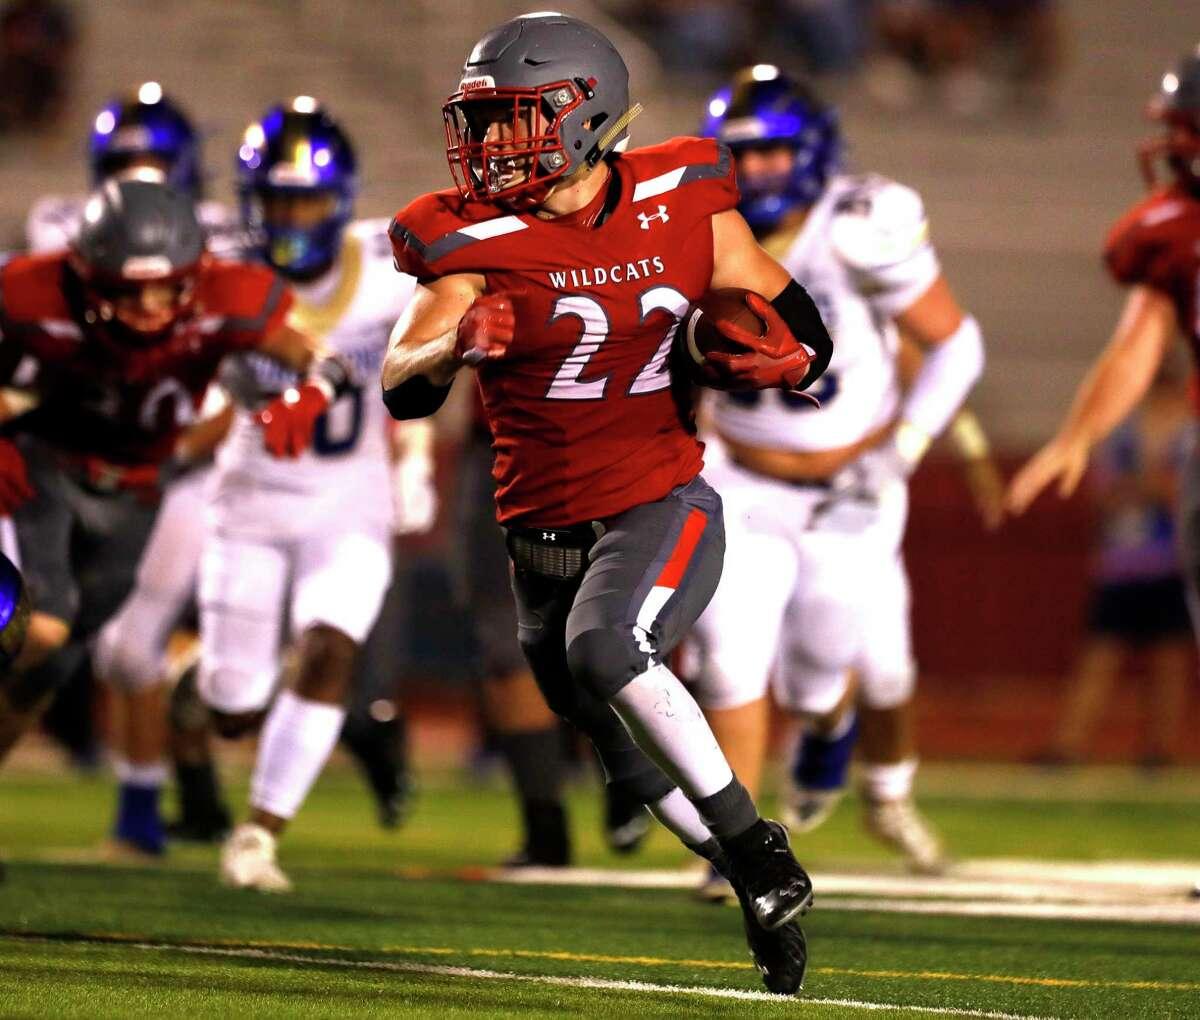 Splendora running back Zane Obregon (22) runs the ball during the second quarter of a high school football game, Friday, Sept. 16, 2021, in Splendora.